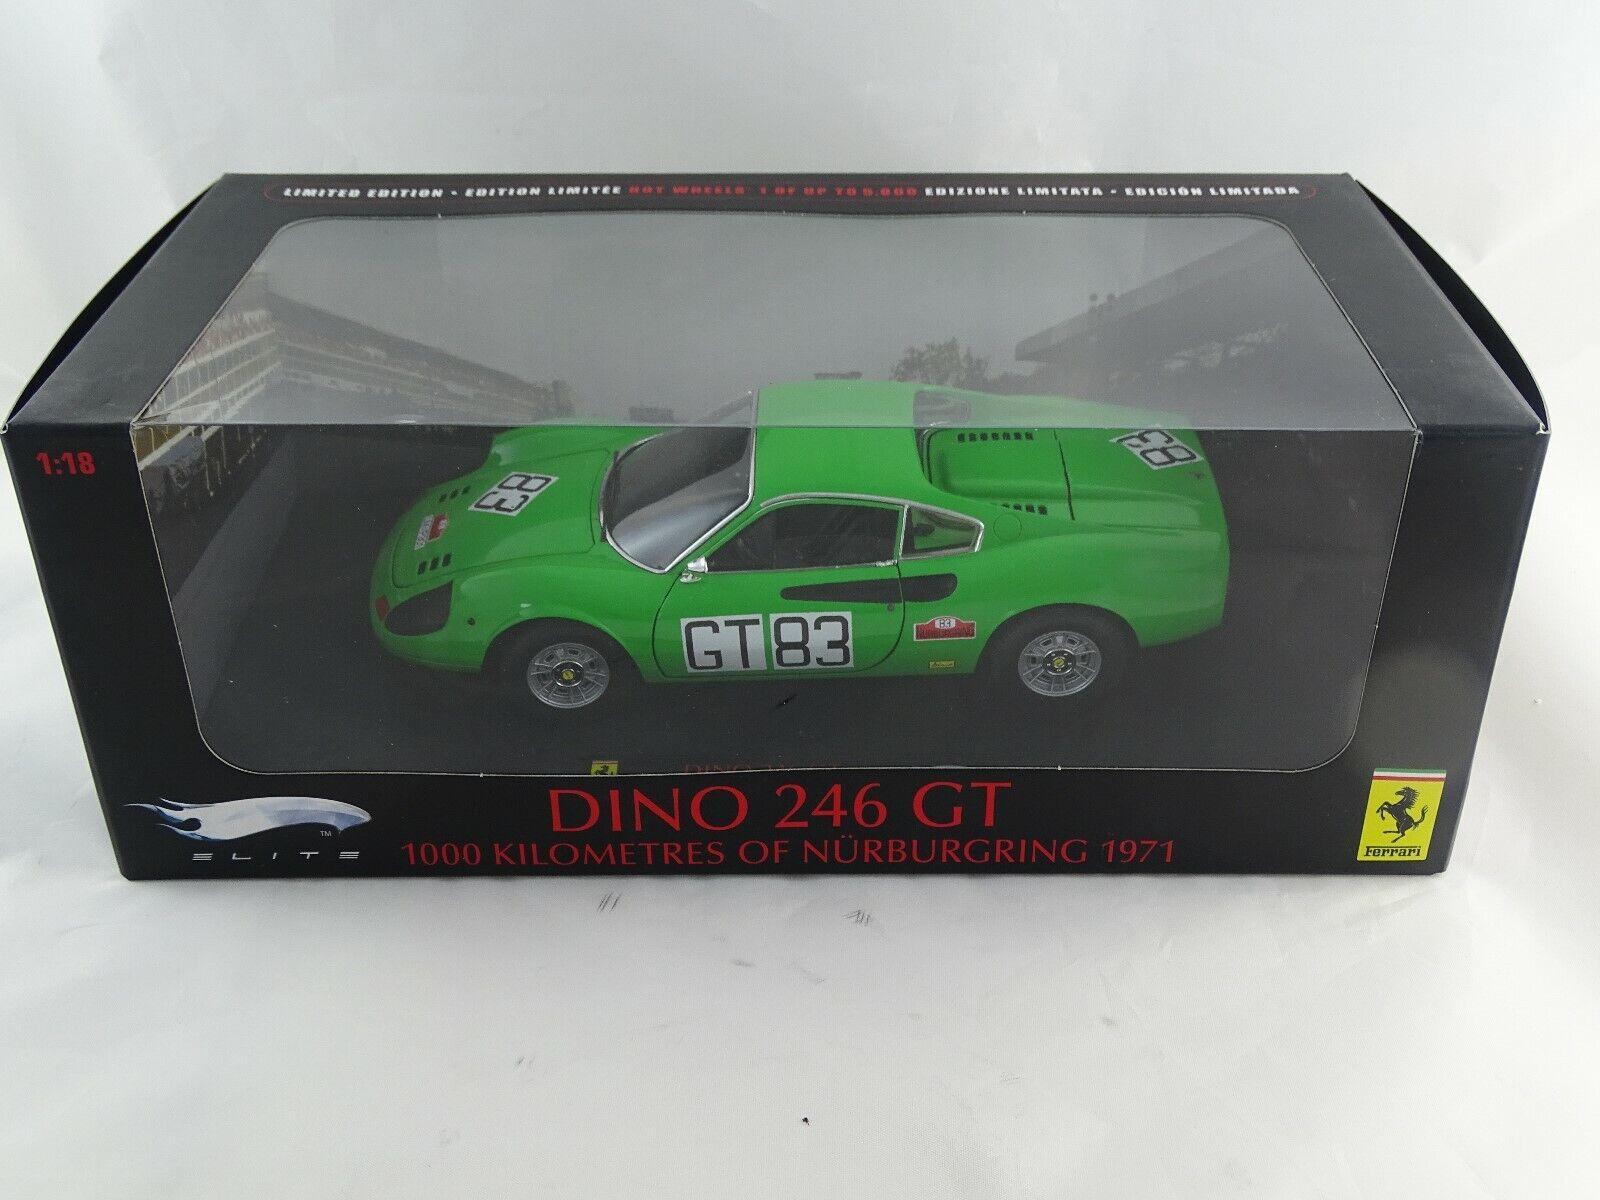 1 18  Mattel Elite Ferrari Dino 246 GT 1000 HM of Nürburgbague 1971  83 Vert RAR §  grosses économies